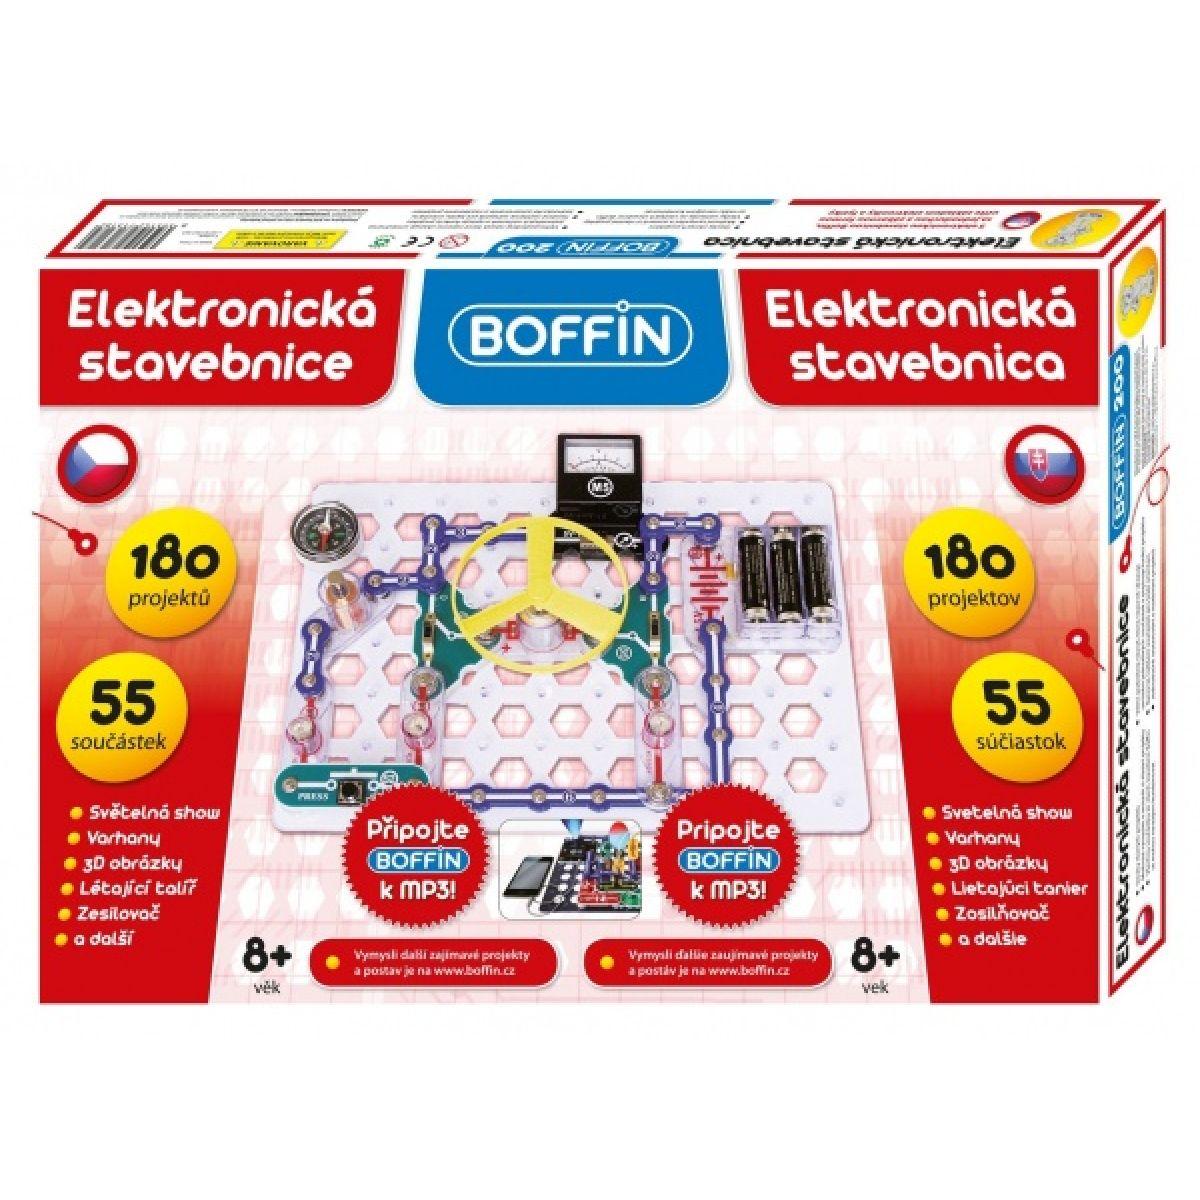 Boffin 200 Elektronická stavebnice